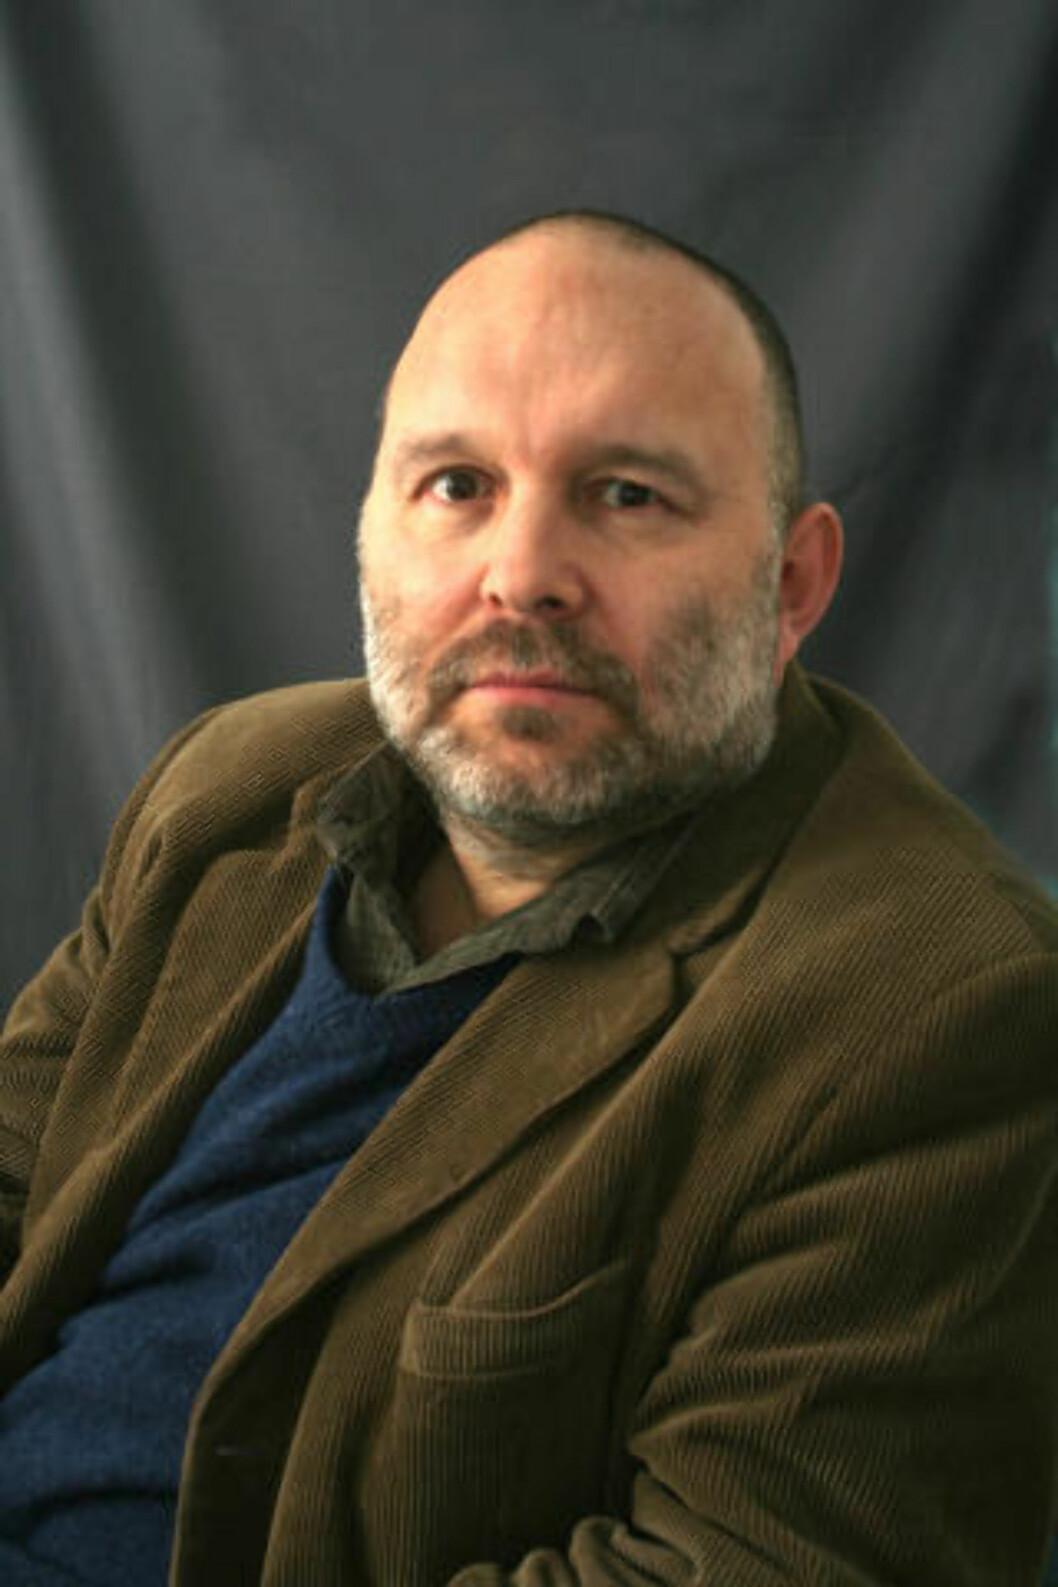 IKKE OVERRASKET: Nupi-forsker Jakub M. Godzimirski bekrefter meldingene om store interne problemer i den russiske forsvarsstrukturen under krigen i Georgia. Foto: NUPI